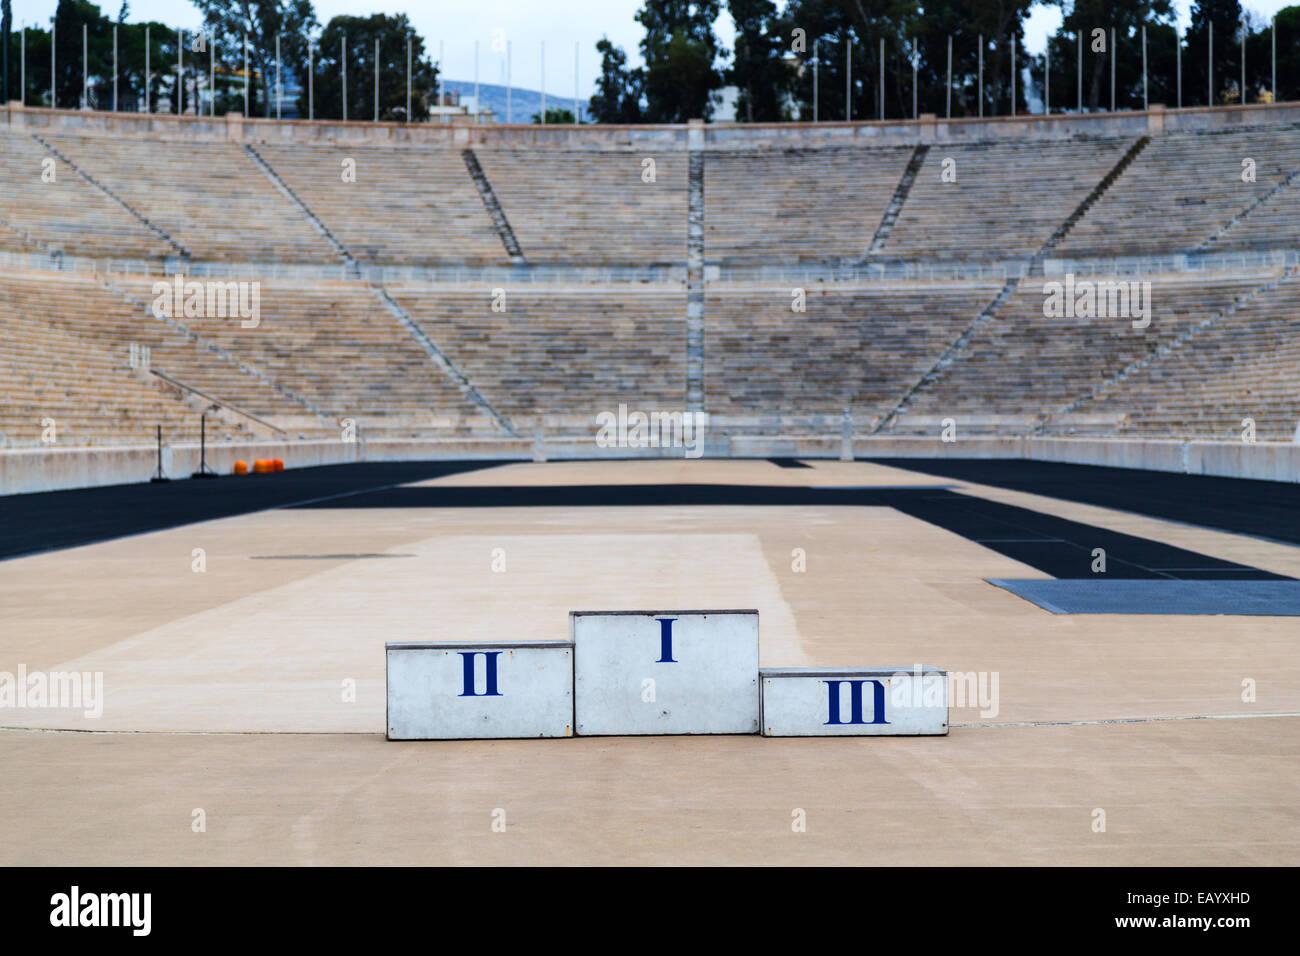 Greece, Athens, the Panathenaic Stadium - built entirely of white marble. - Stock Image